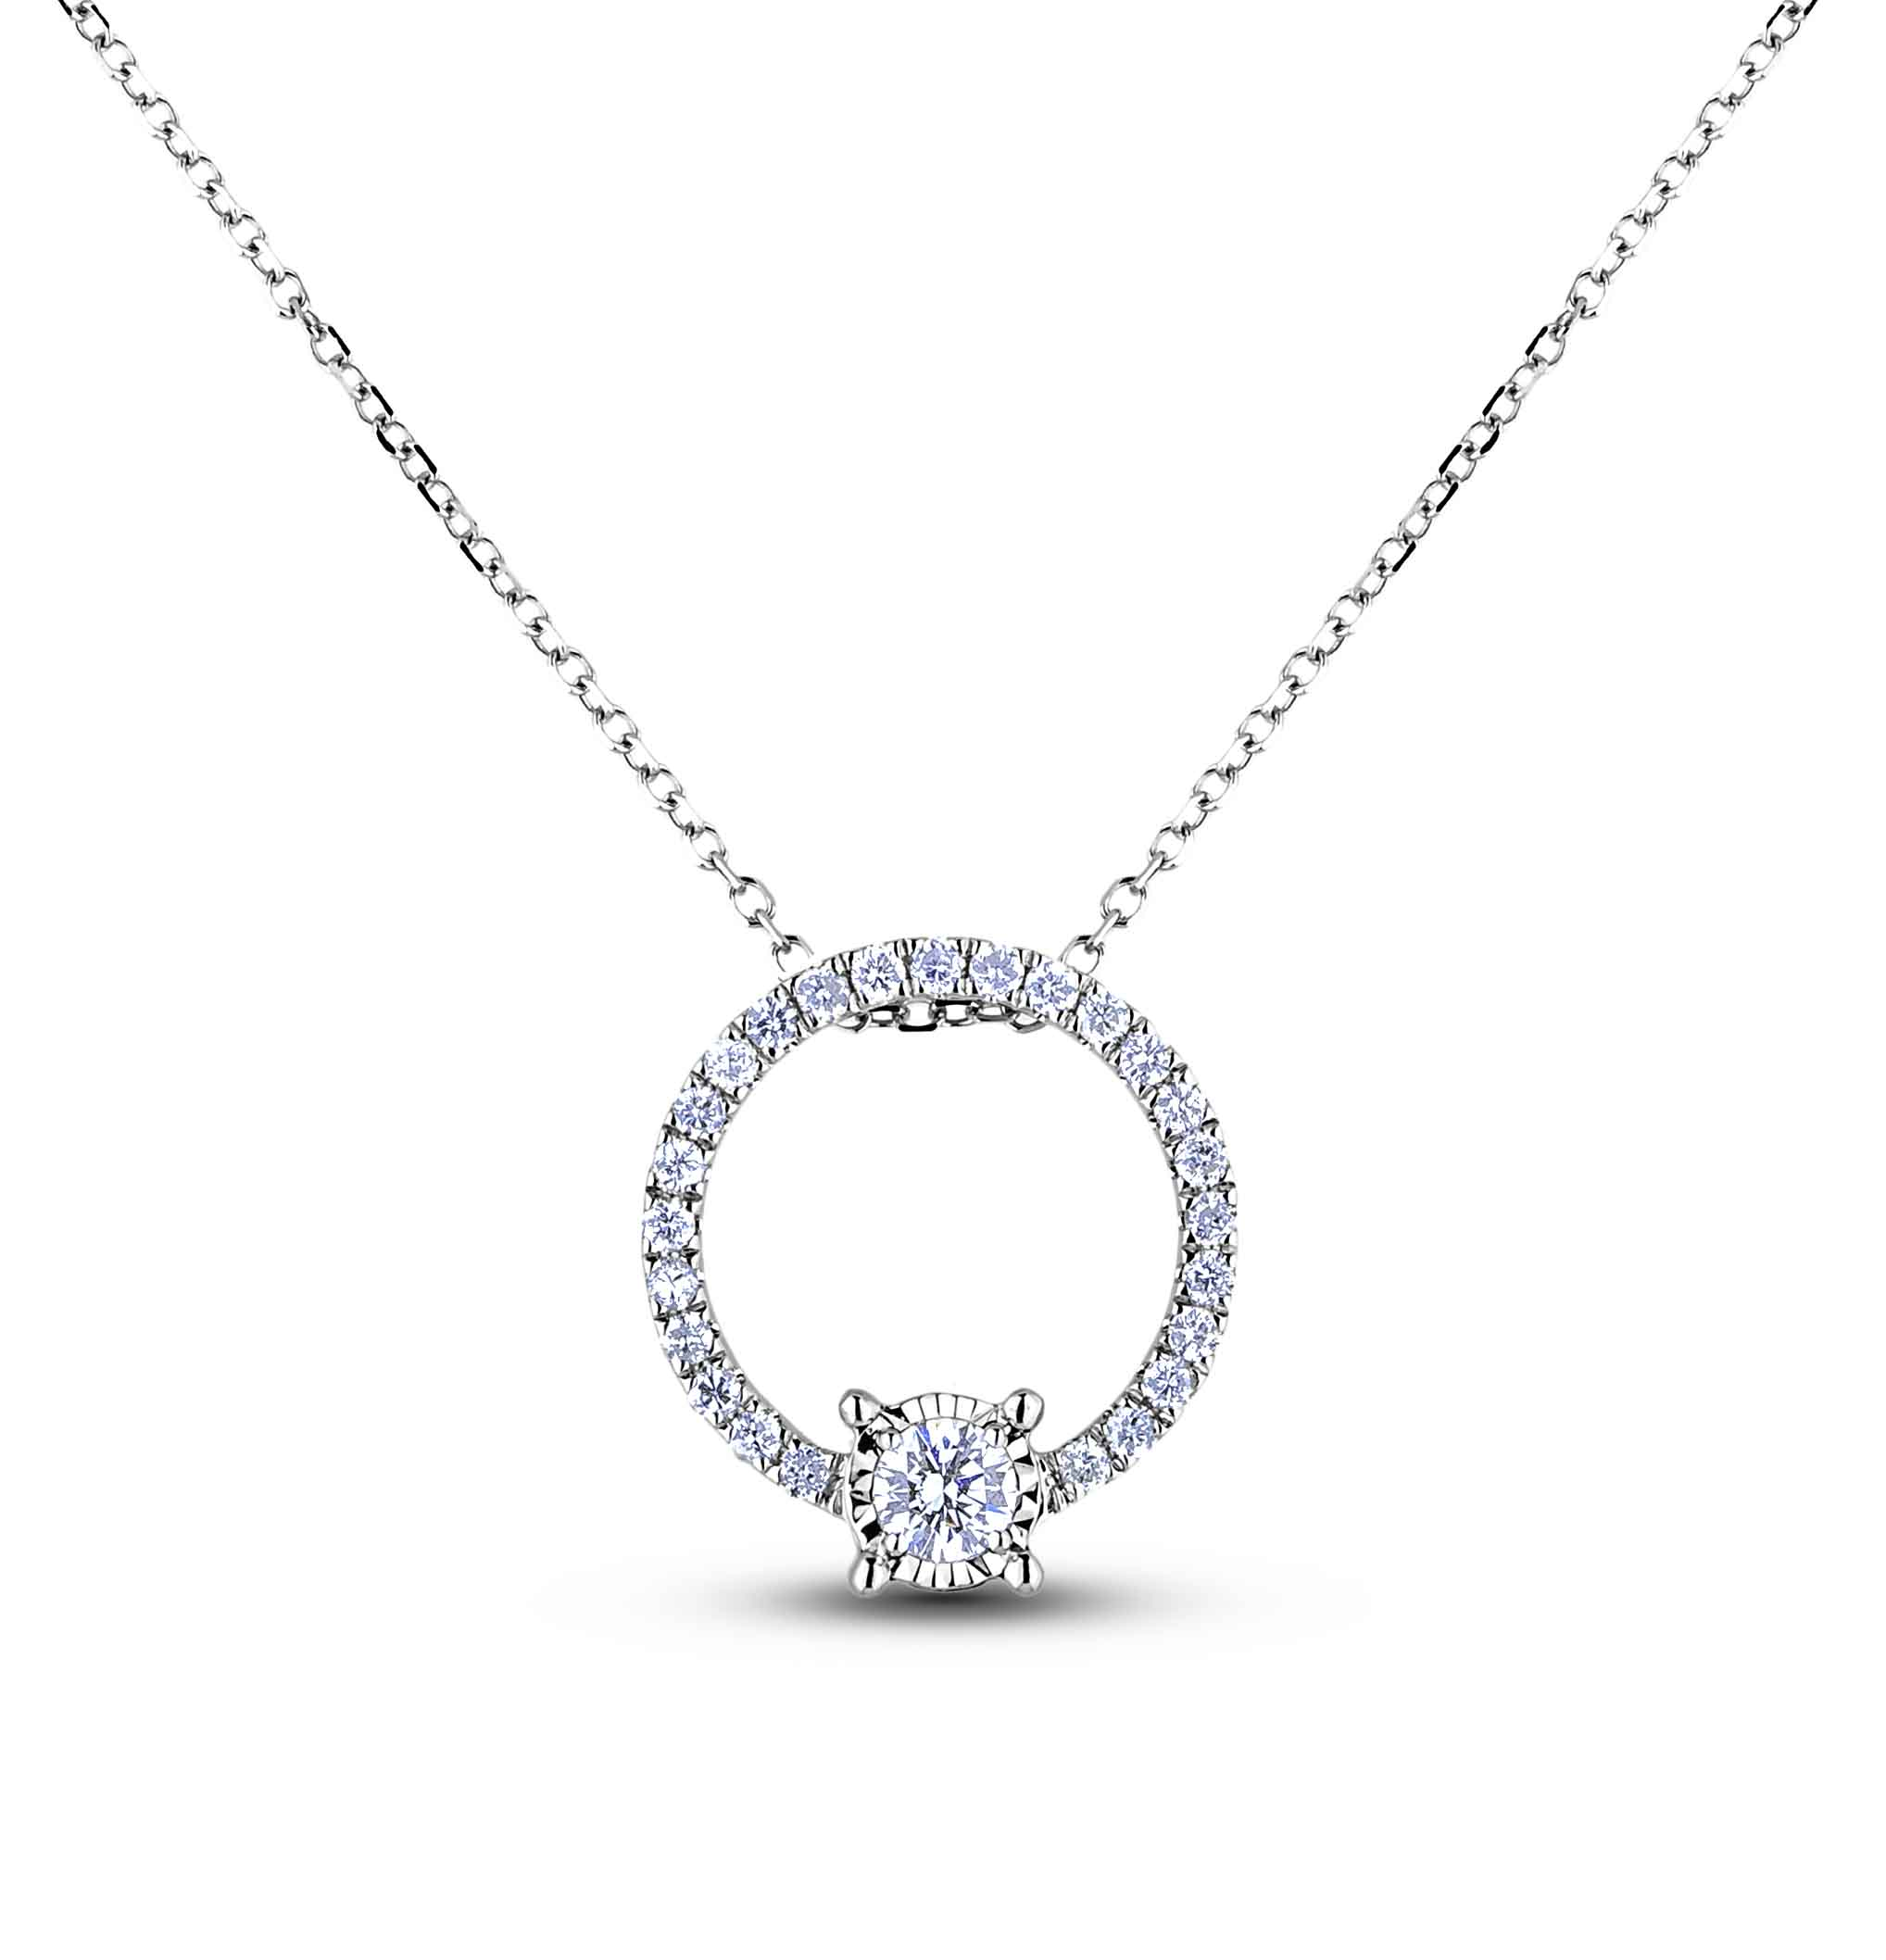 Diamond Pendants JSL-AFCP1335010 (Pendants)